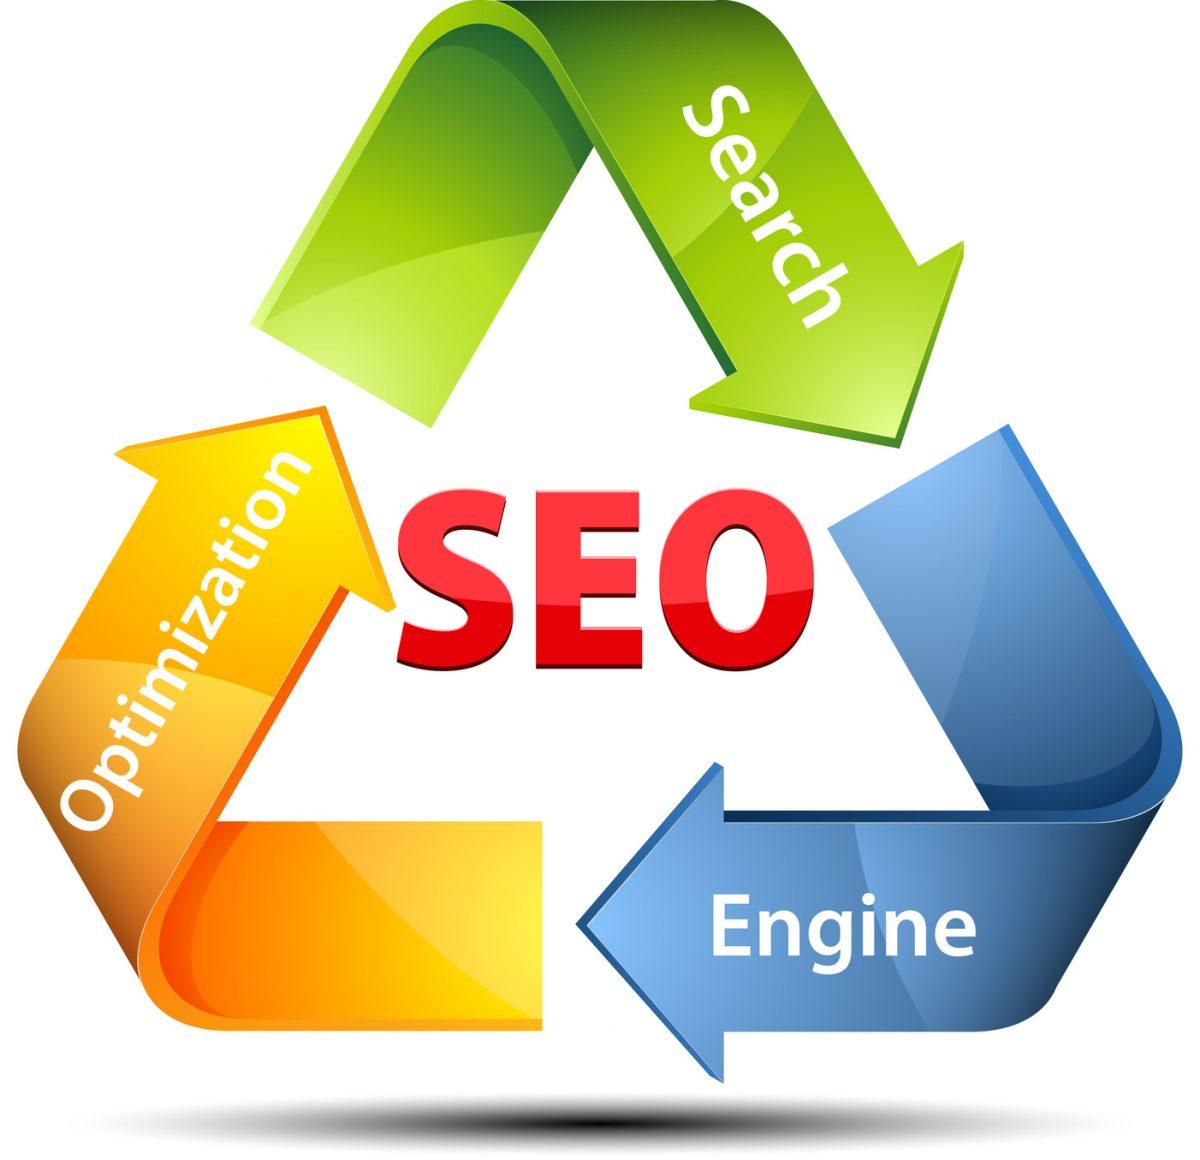 Importance of SEO in web marketing